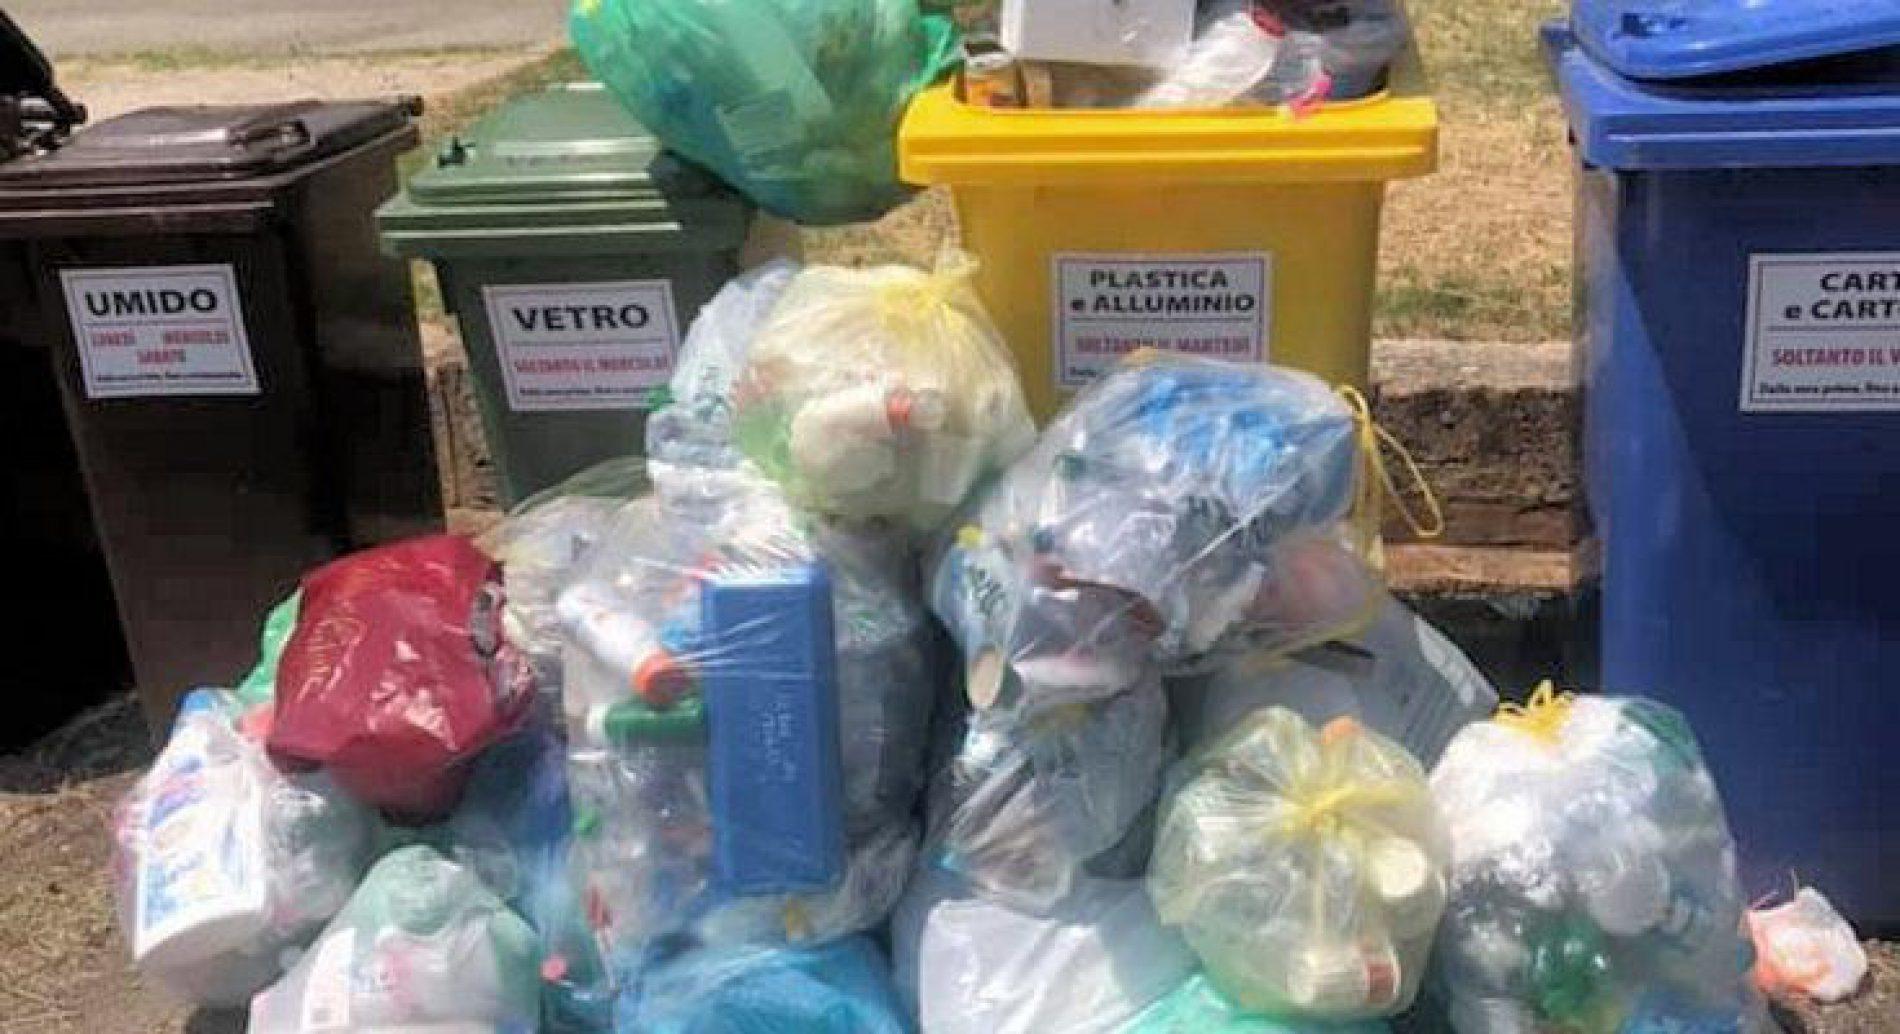 Regione Calabria:All'emergenza Coronavirus si aggiunge l'emergenza rifiuti.